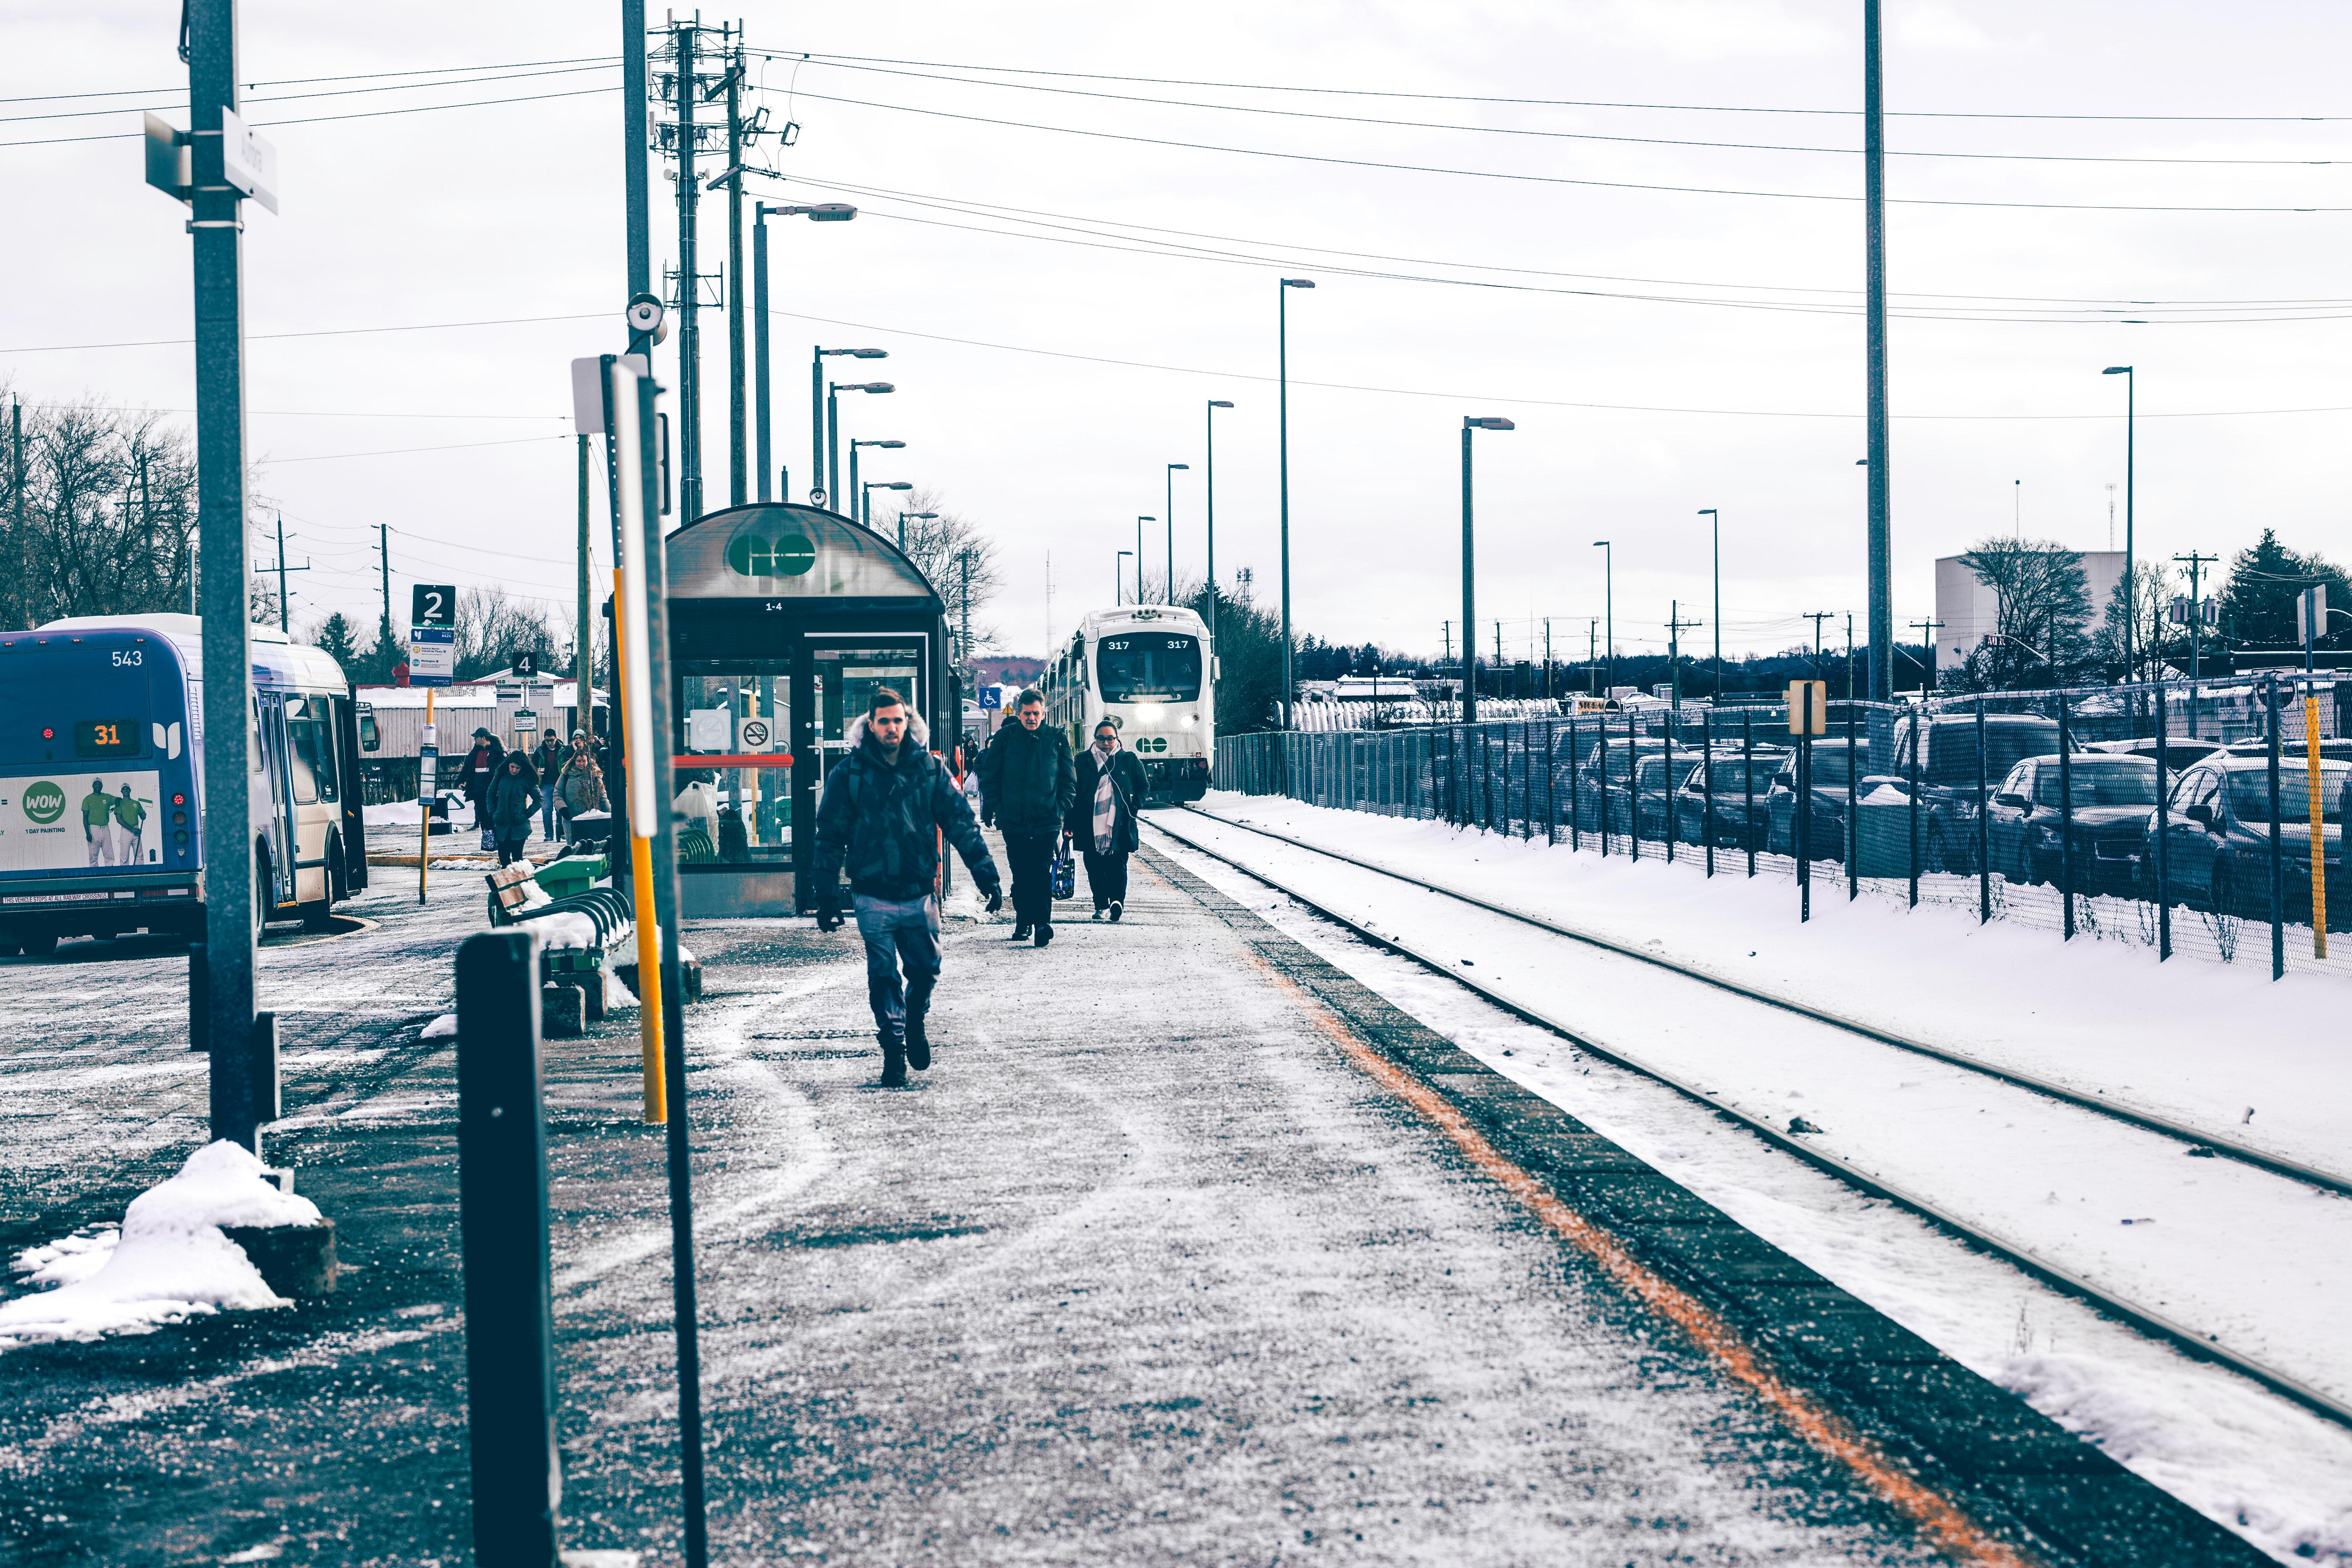 Man Wearing Jacket and Jeans Walking on Road, Platform, Vehicles, Urban, Transportation system, HQ Photo